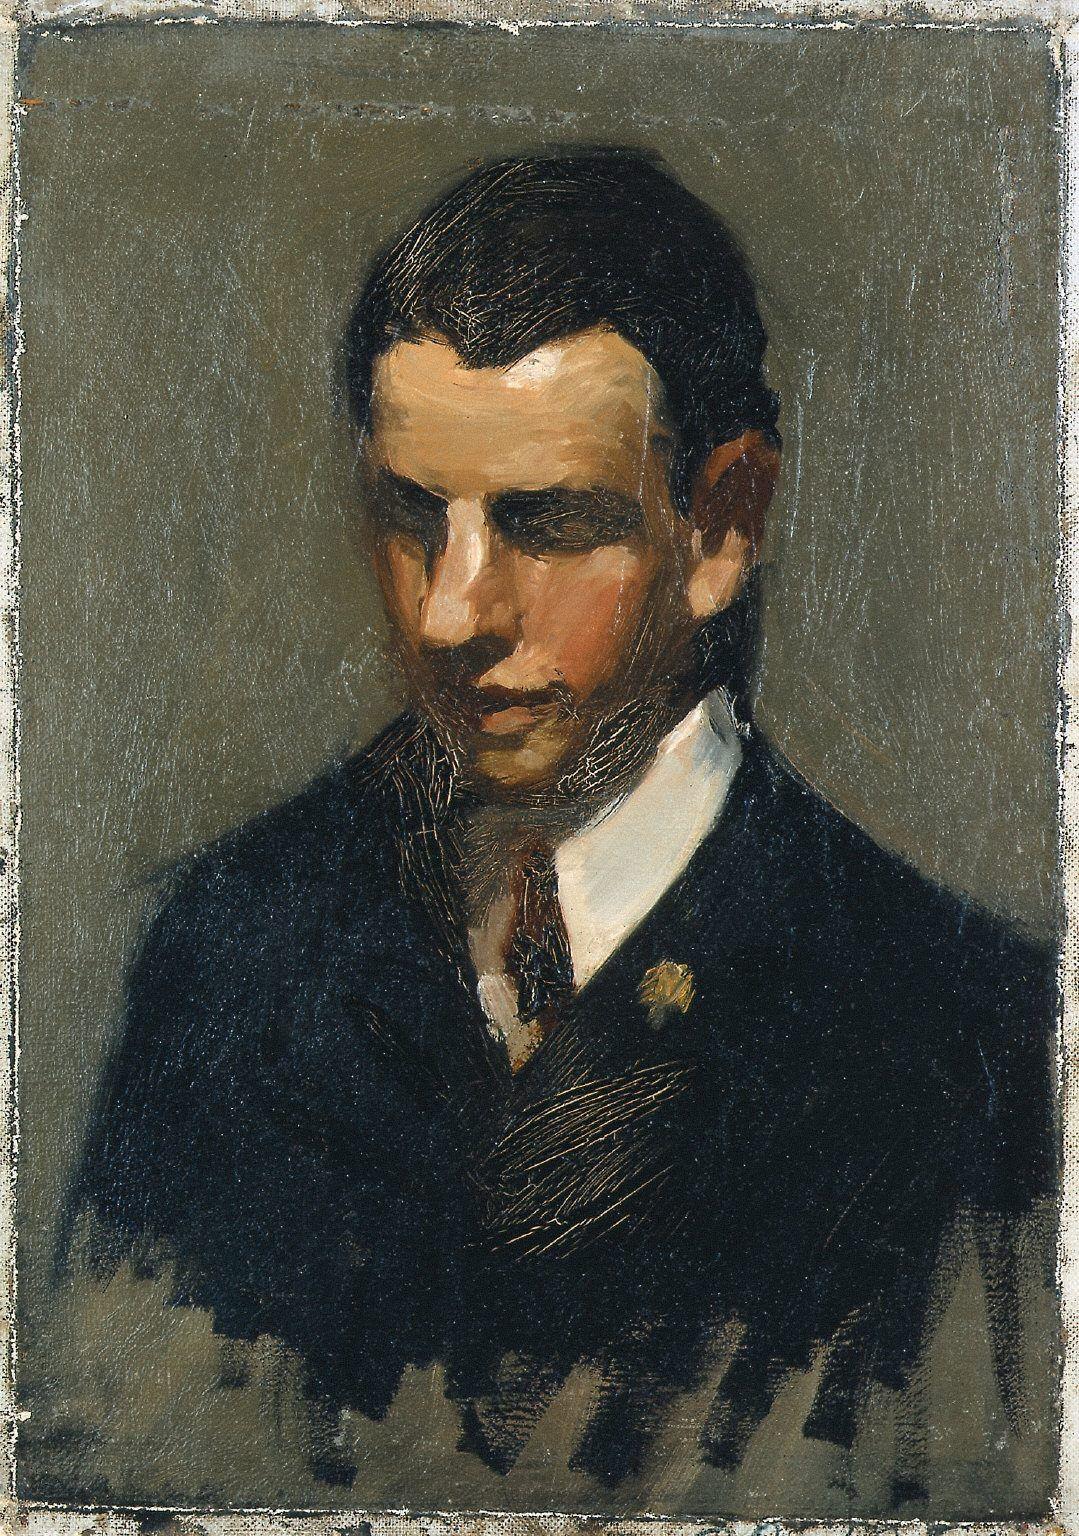 Edward Hopper 1882-1967 Portrait Of Man 1903-1906 Whitney Museum American Art